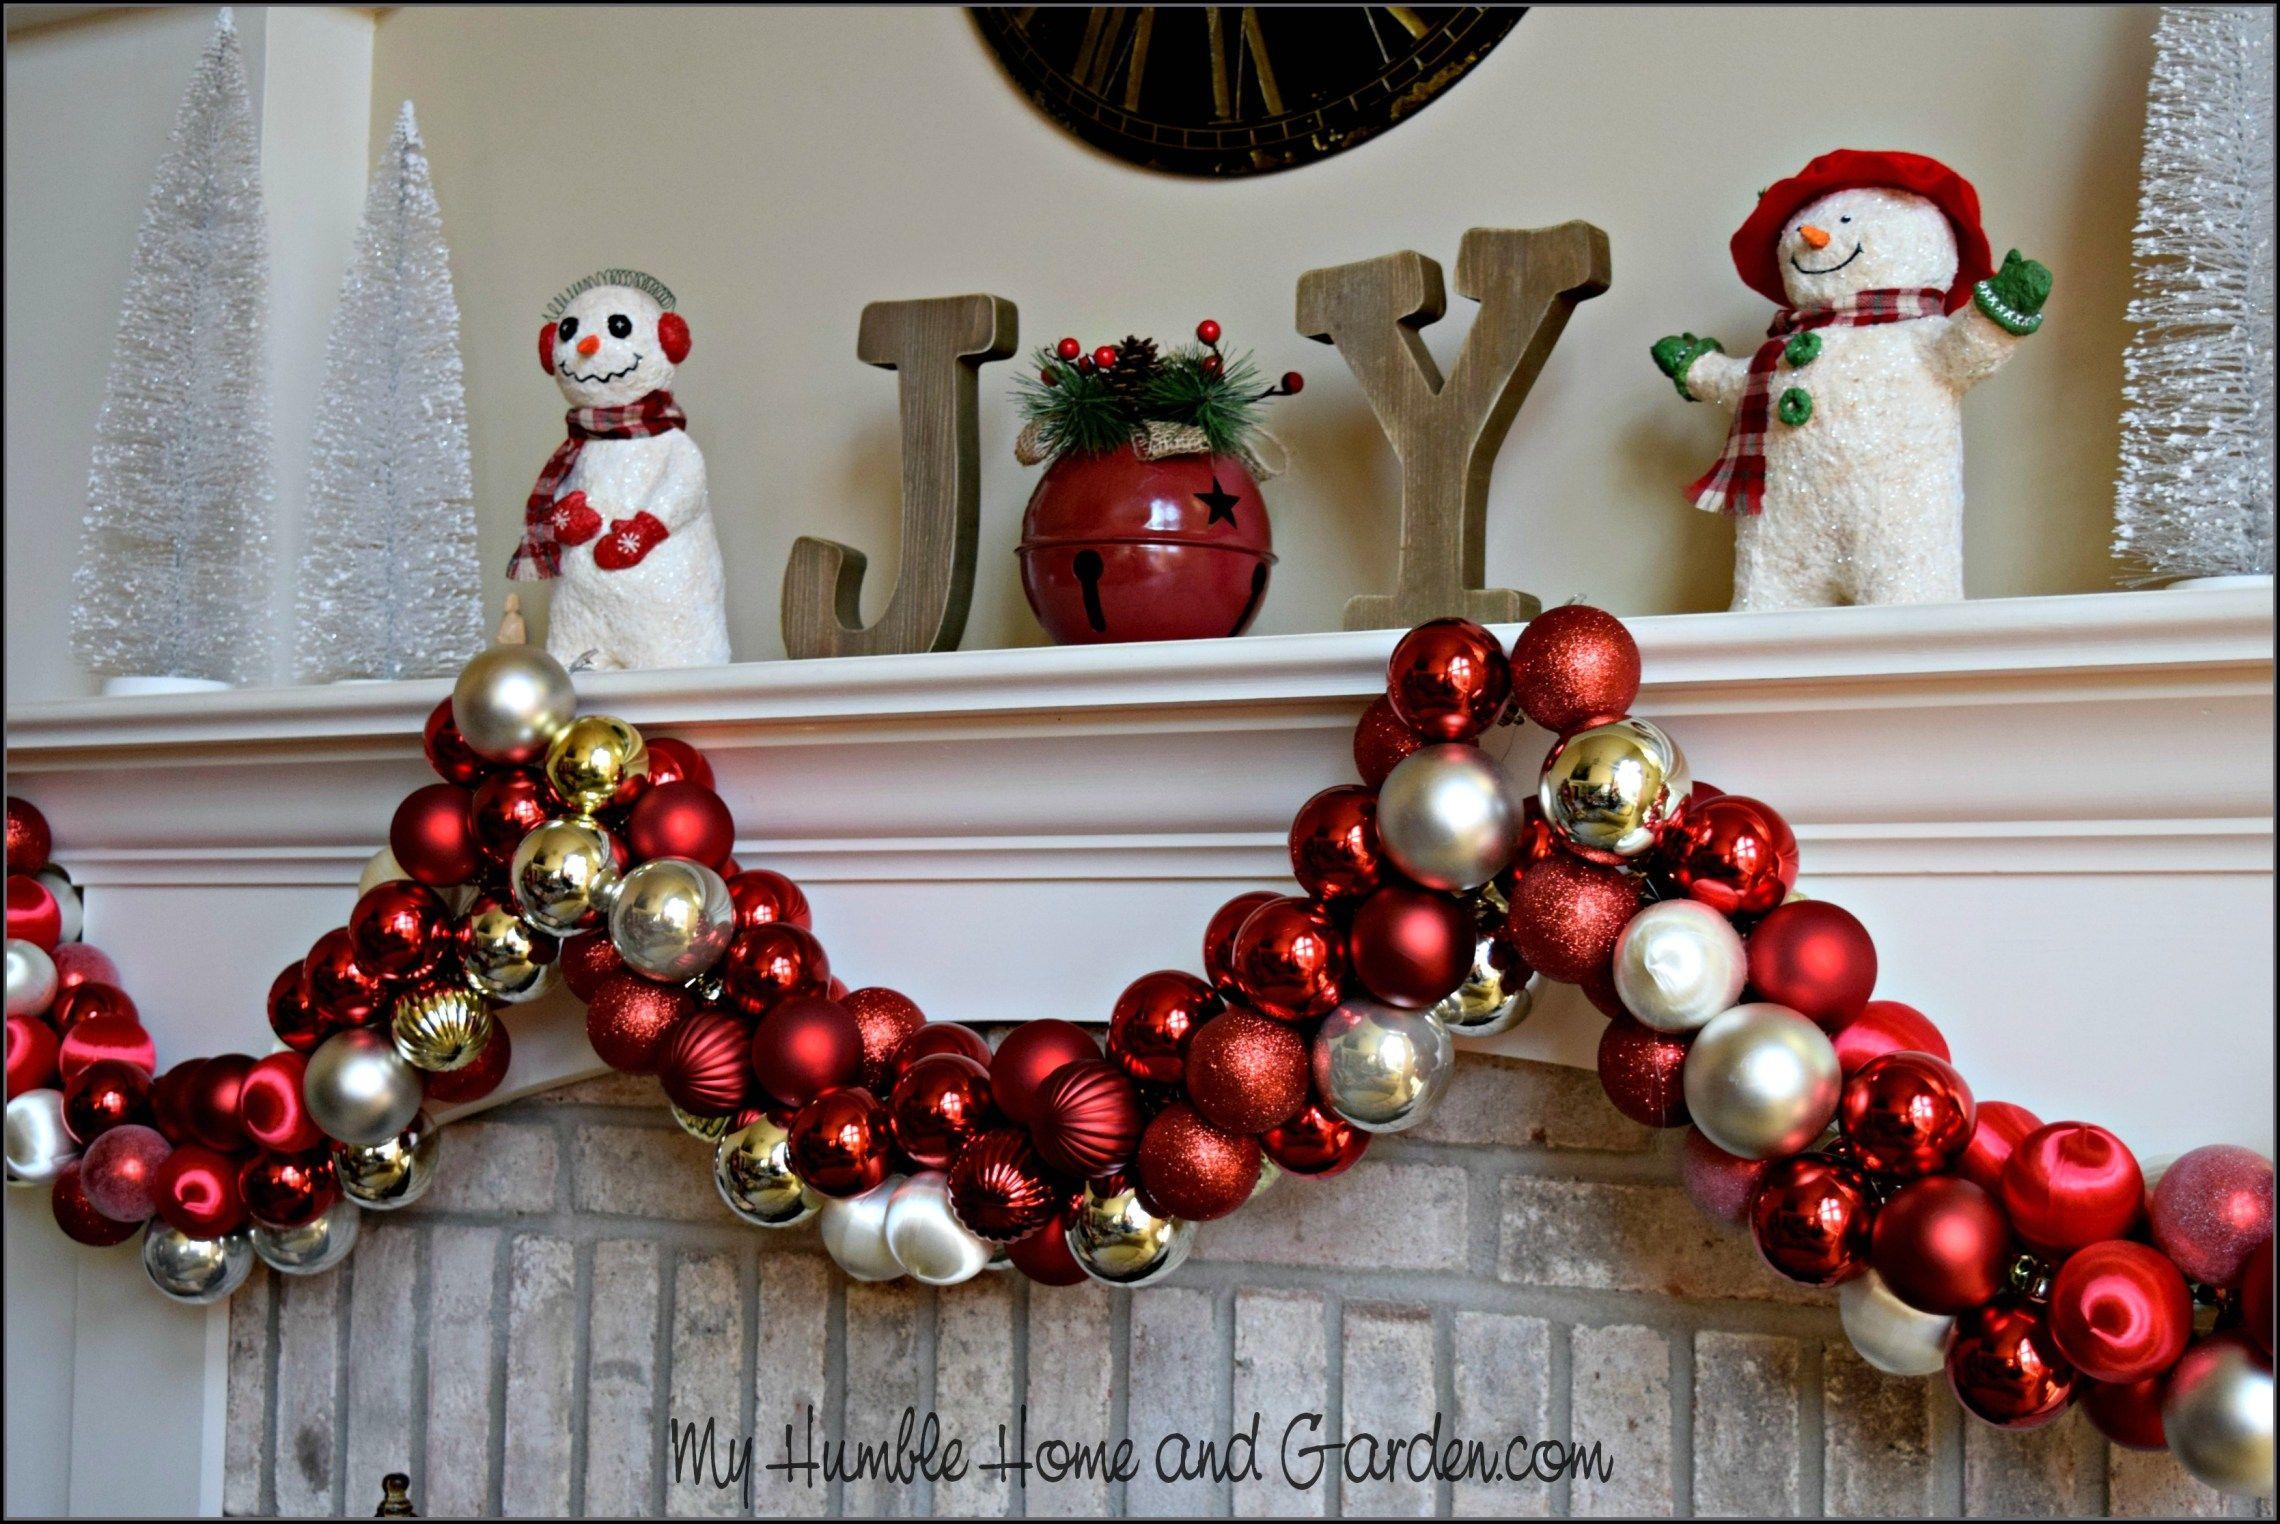 How To Easily Make Beautiful Christmas Ornament Garland Large Christmas Ornaments Ornament Garland Ornament Garland Diy